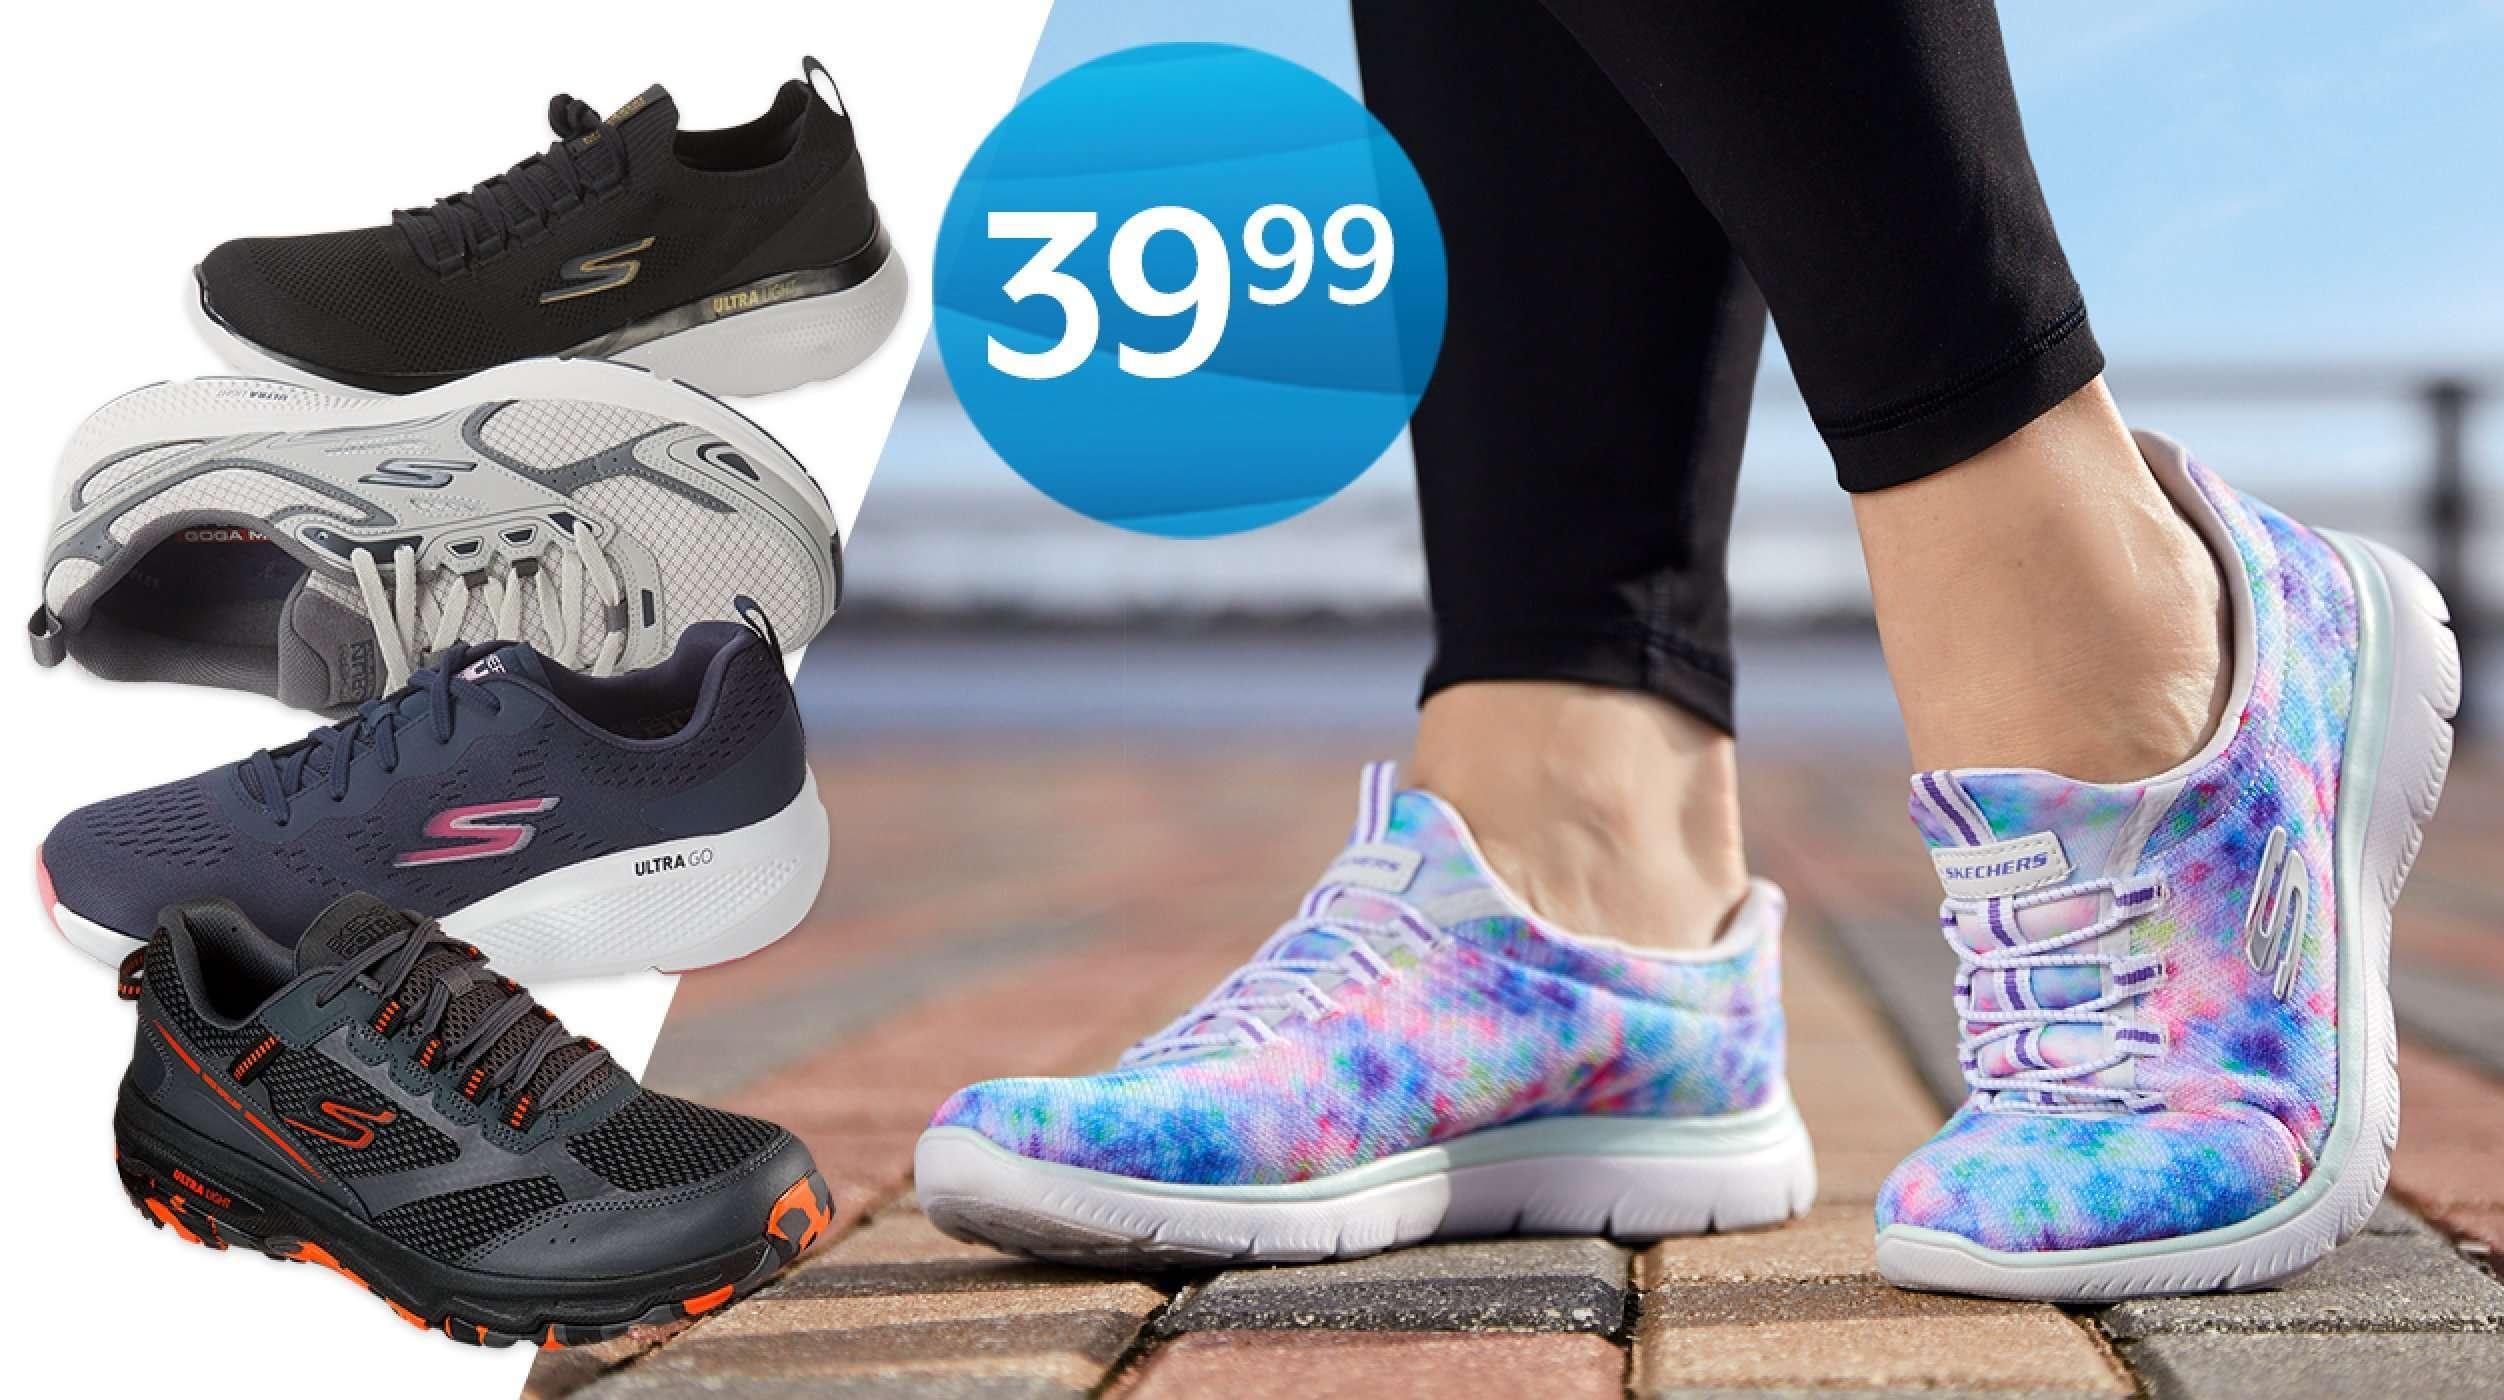 39.99 Skechers athletic shoes for men & women